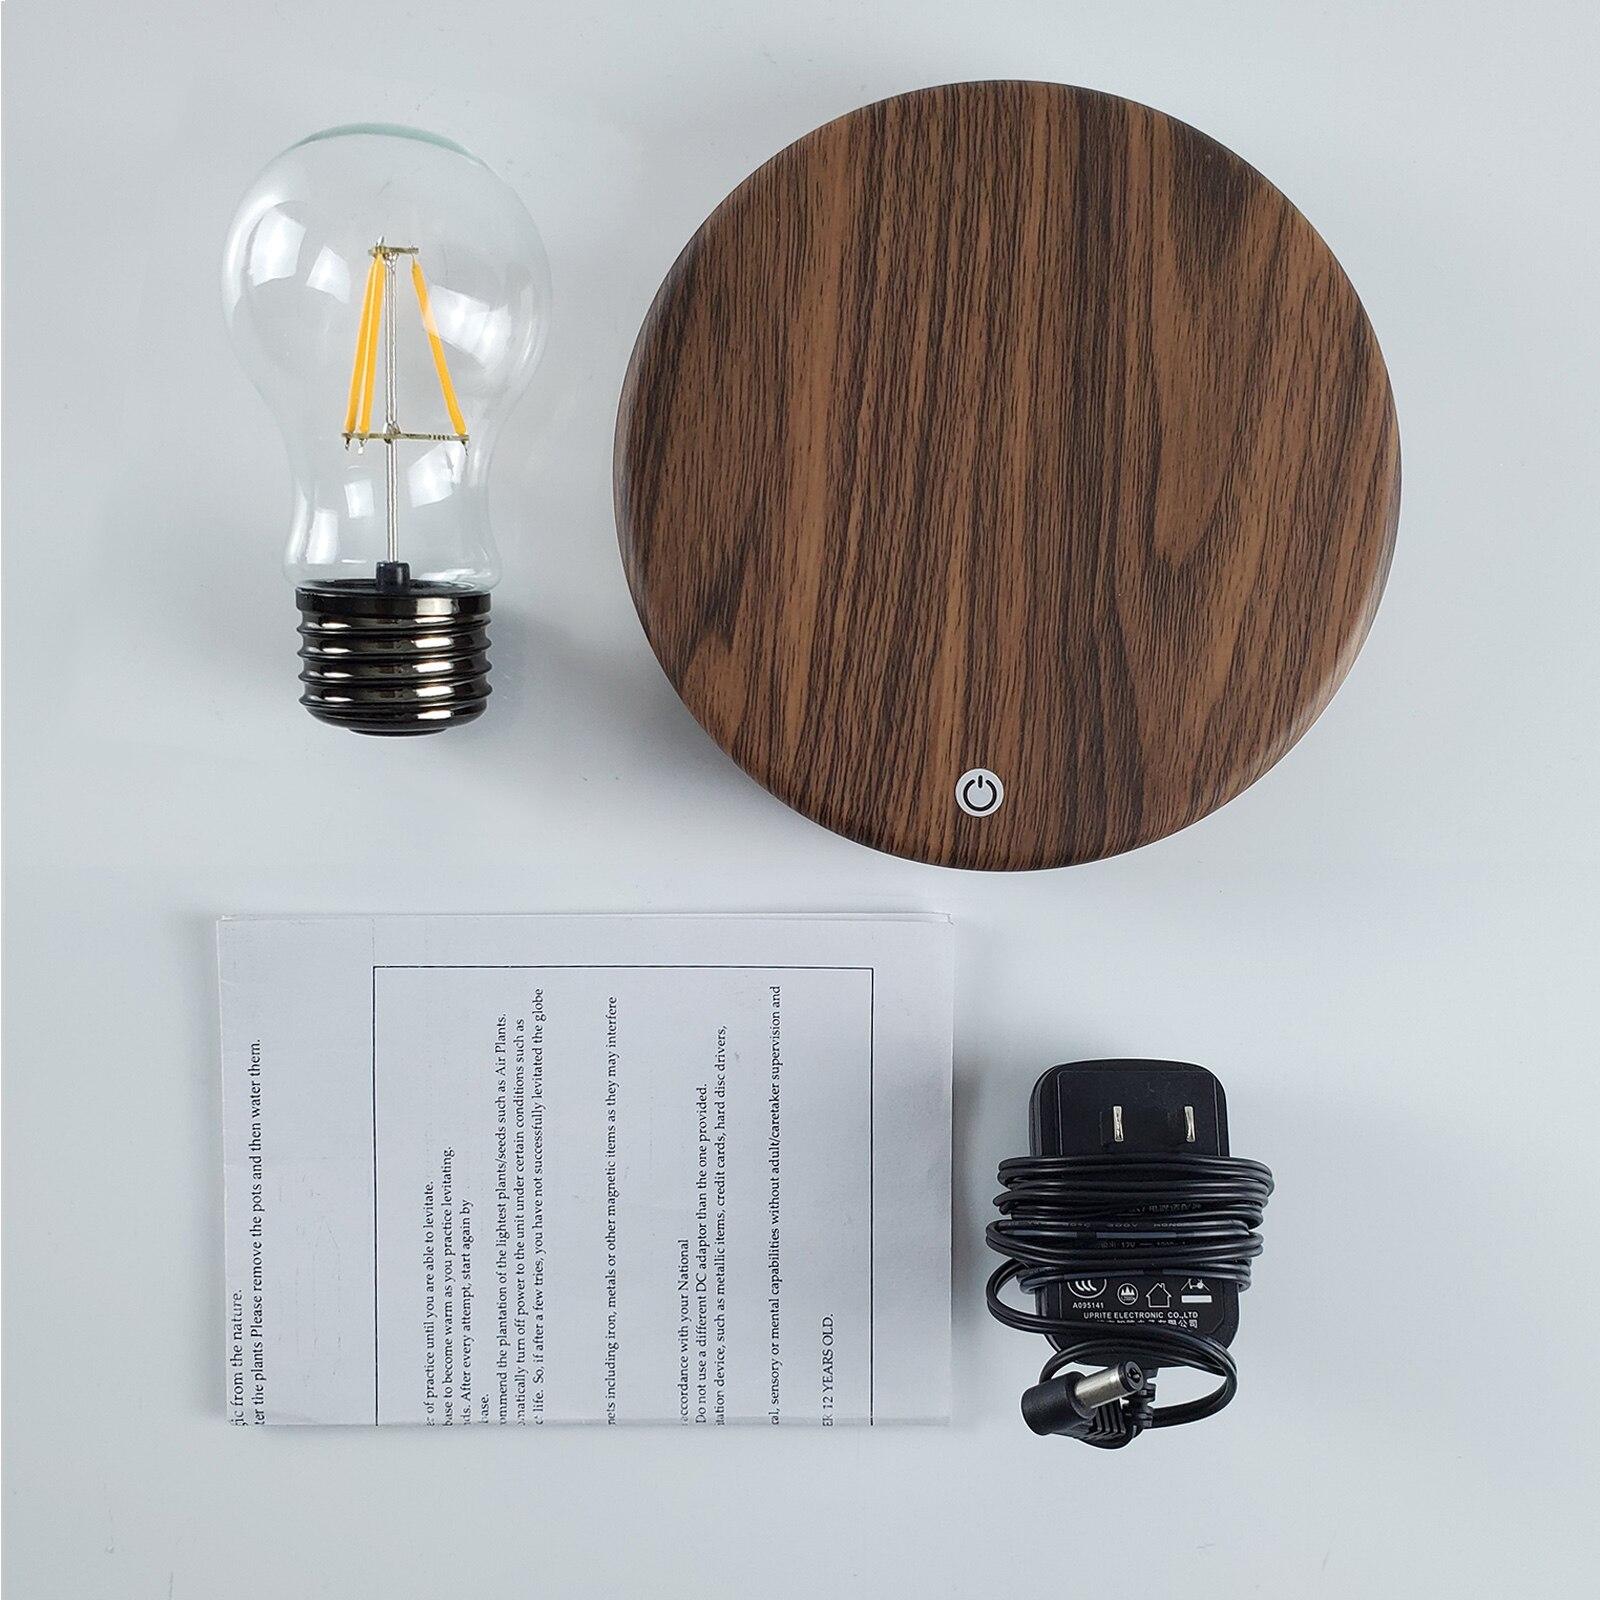 Magnetic Levitating Lamp Bulb Novelty Lighting Creative Night Light Desk Decor Table Lamp Room Decor For Bedside Bedroom Desk enlarge